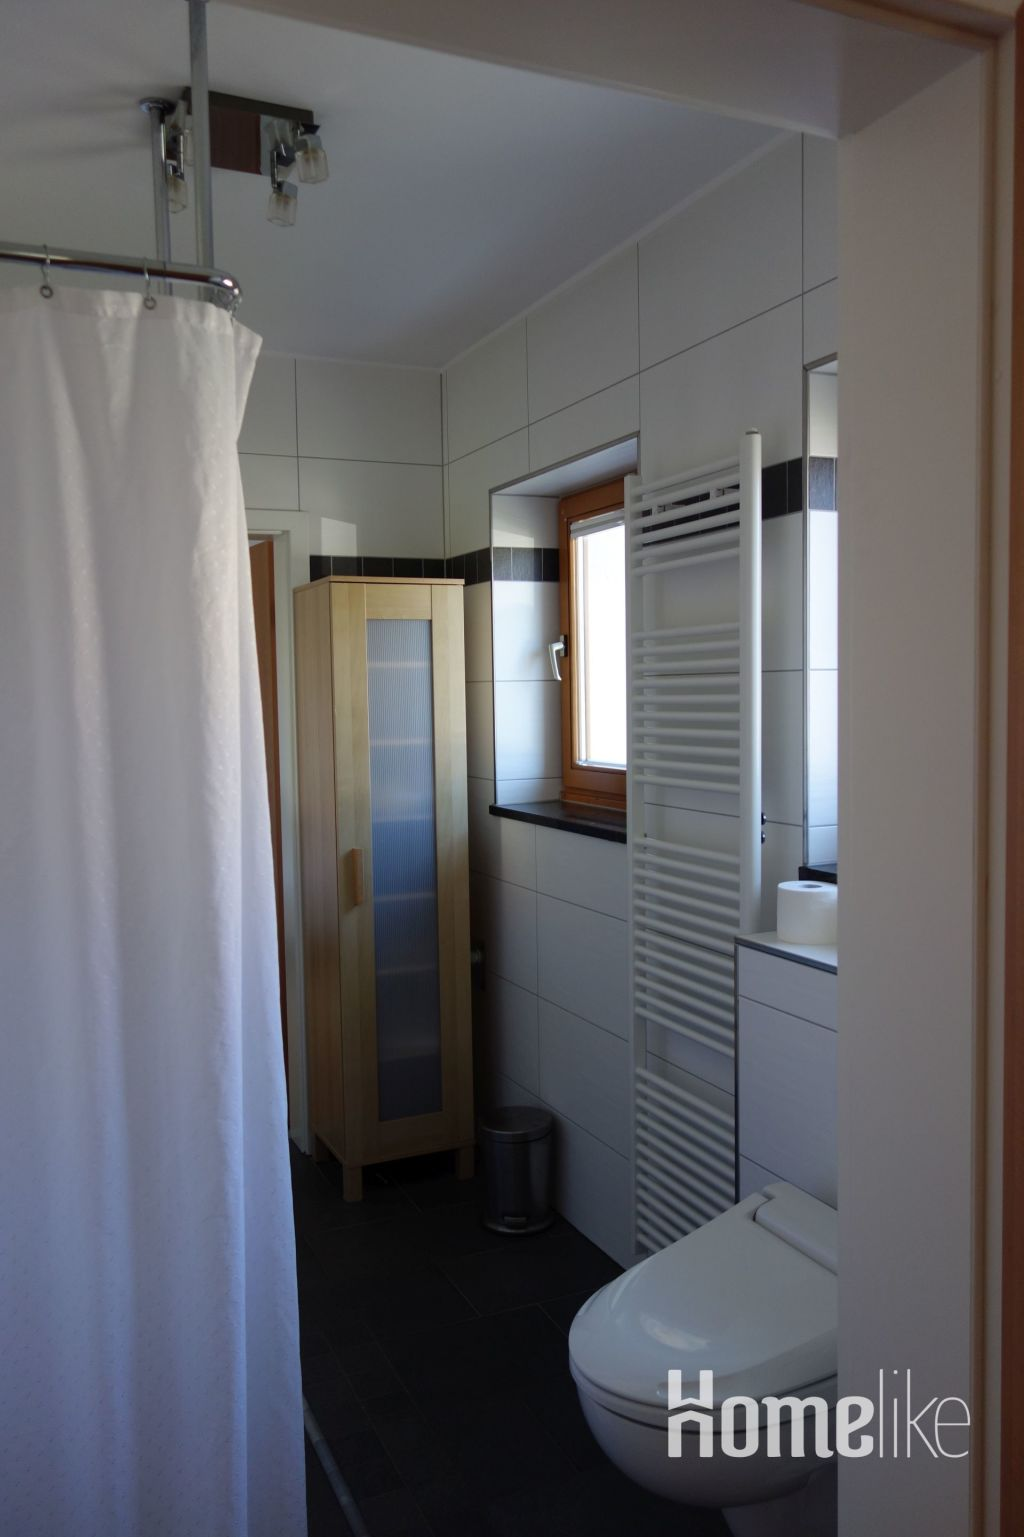 image 5 furnished 1 bedroom Apartment for rent in Nuremberg, Bavaria (Munich)